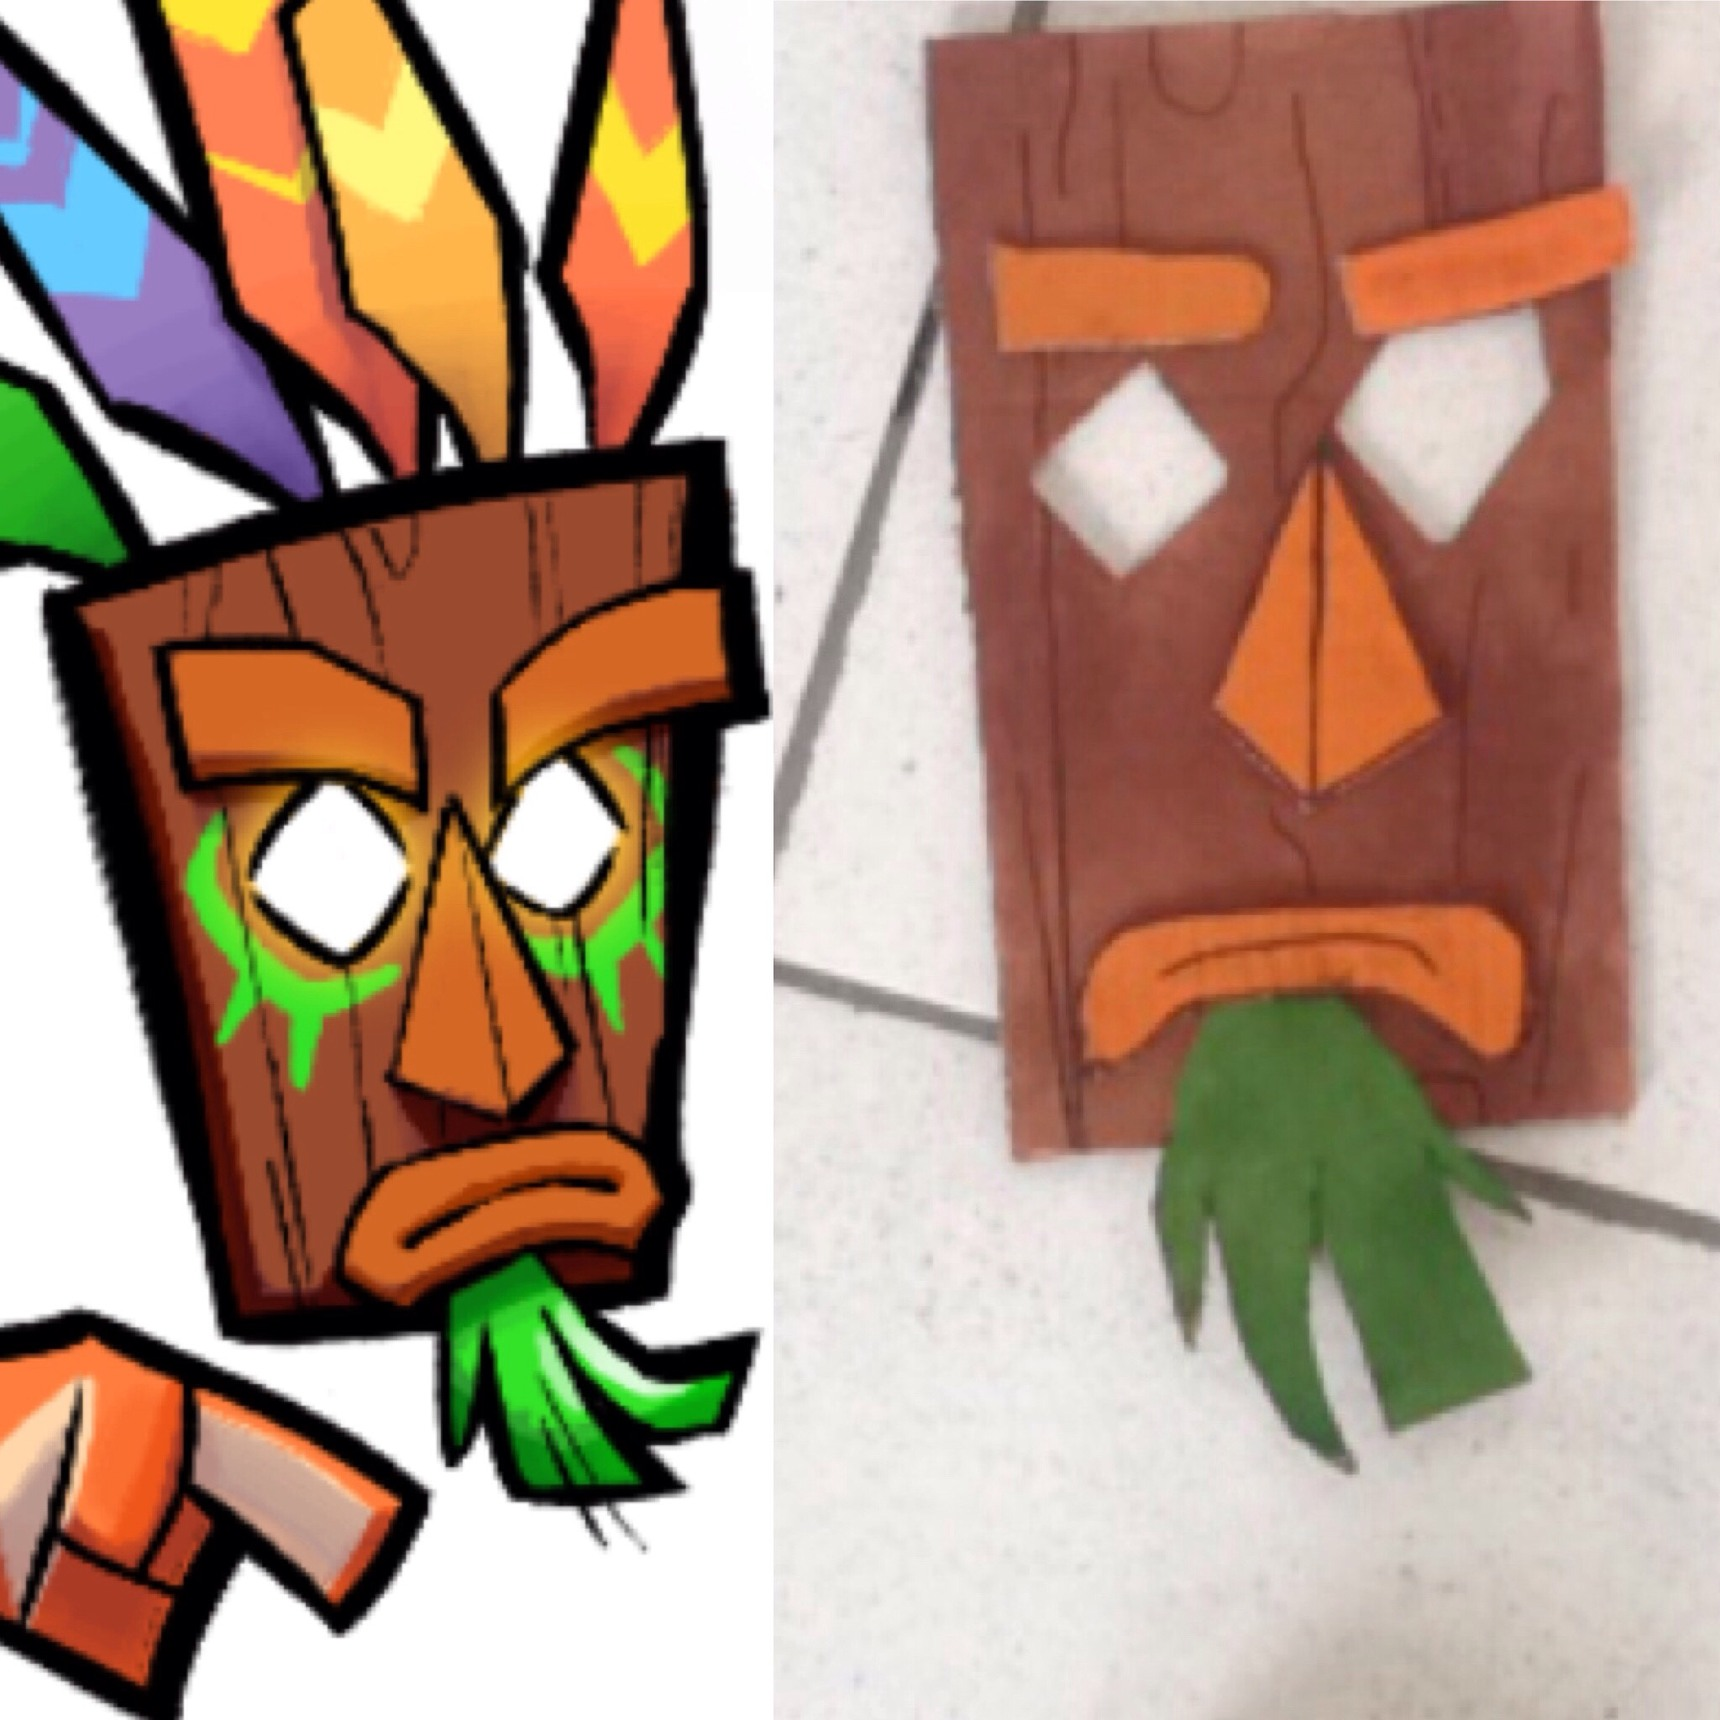 Crash Bandicoot na aula de artes - meme